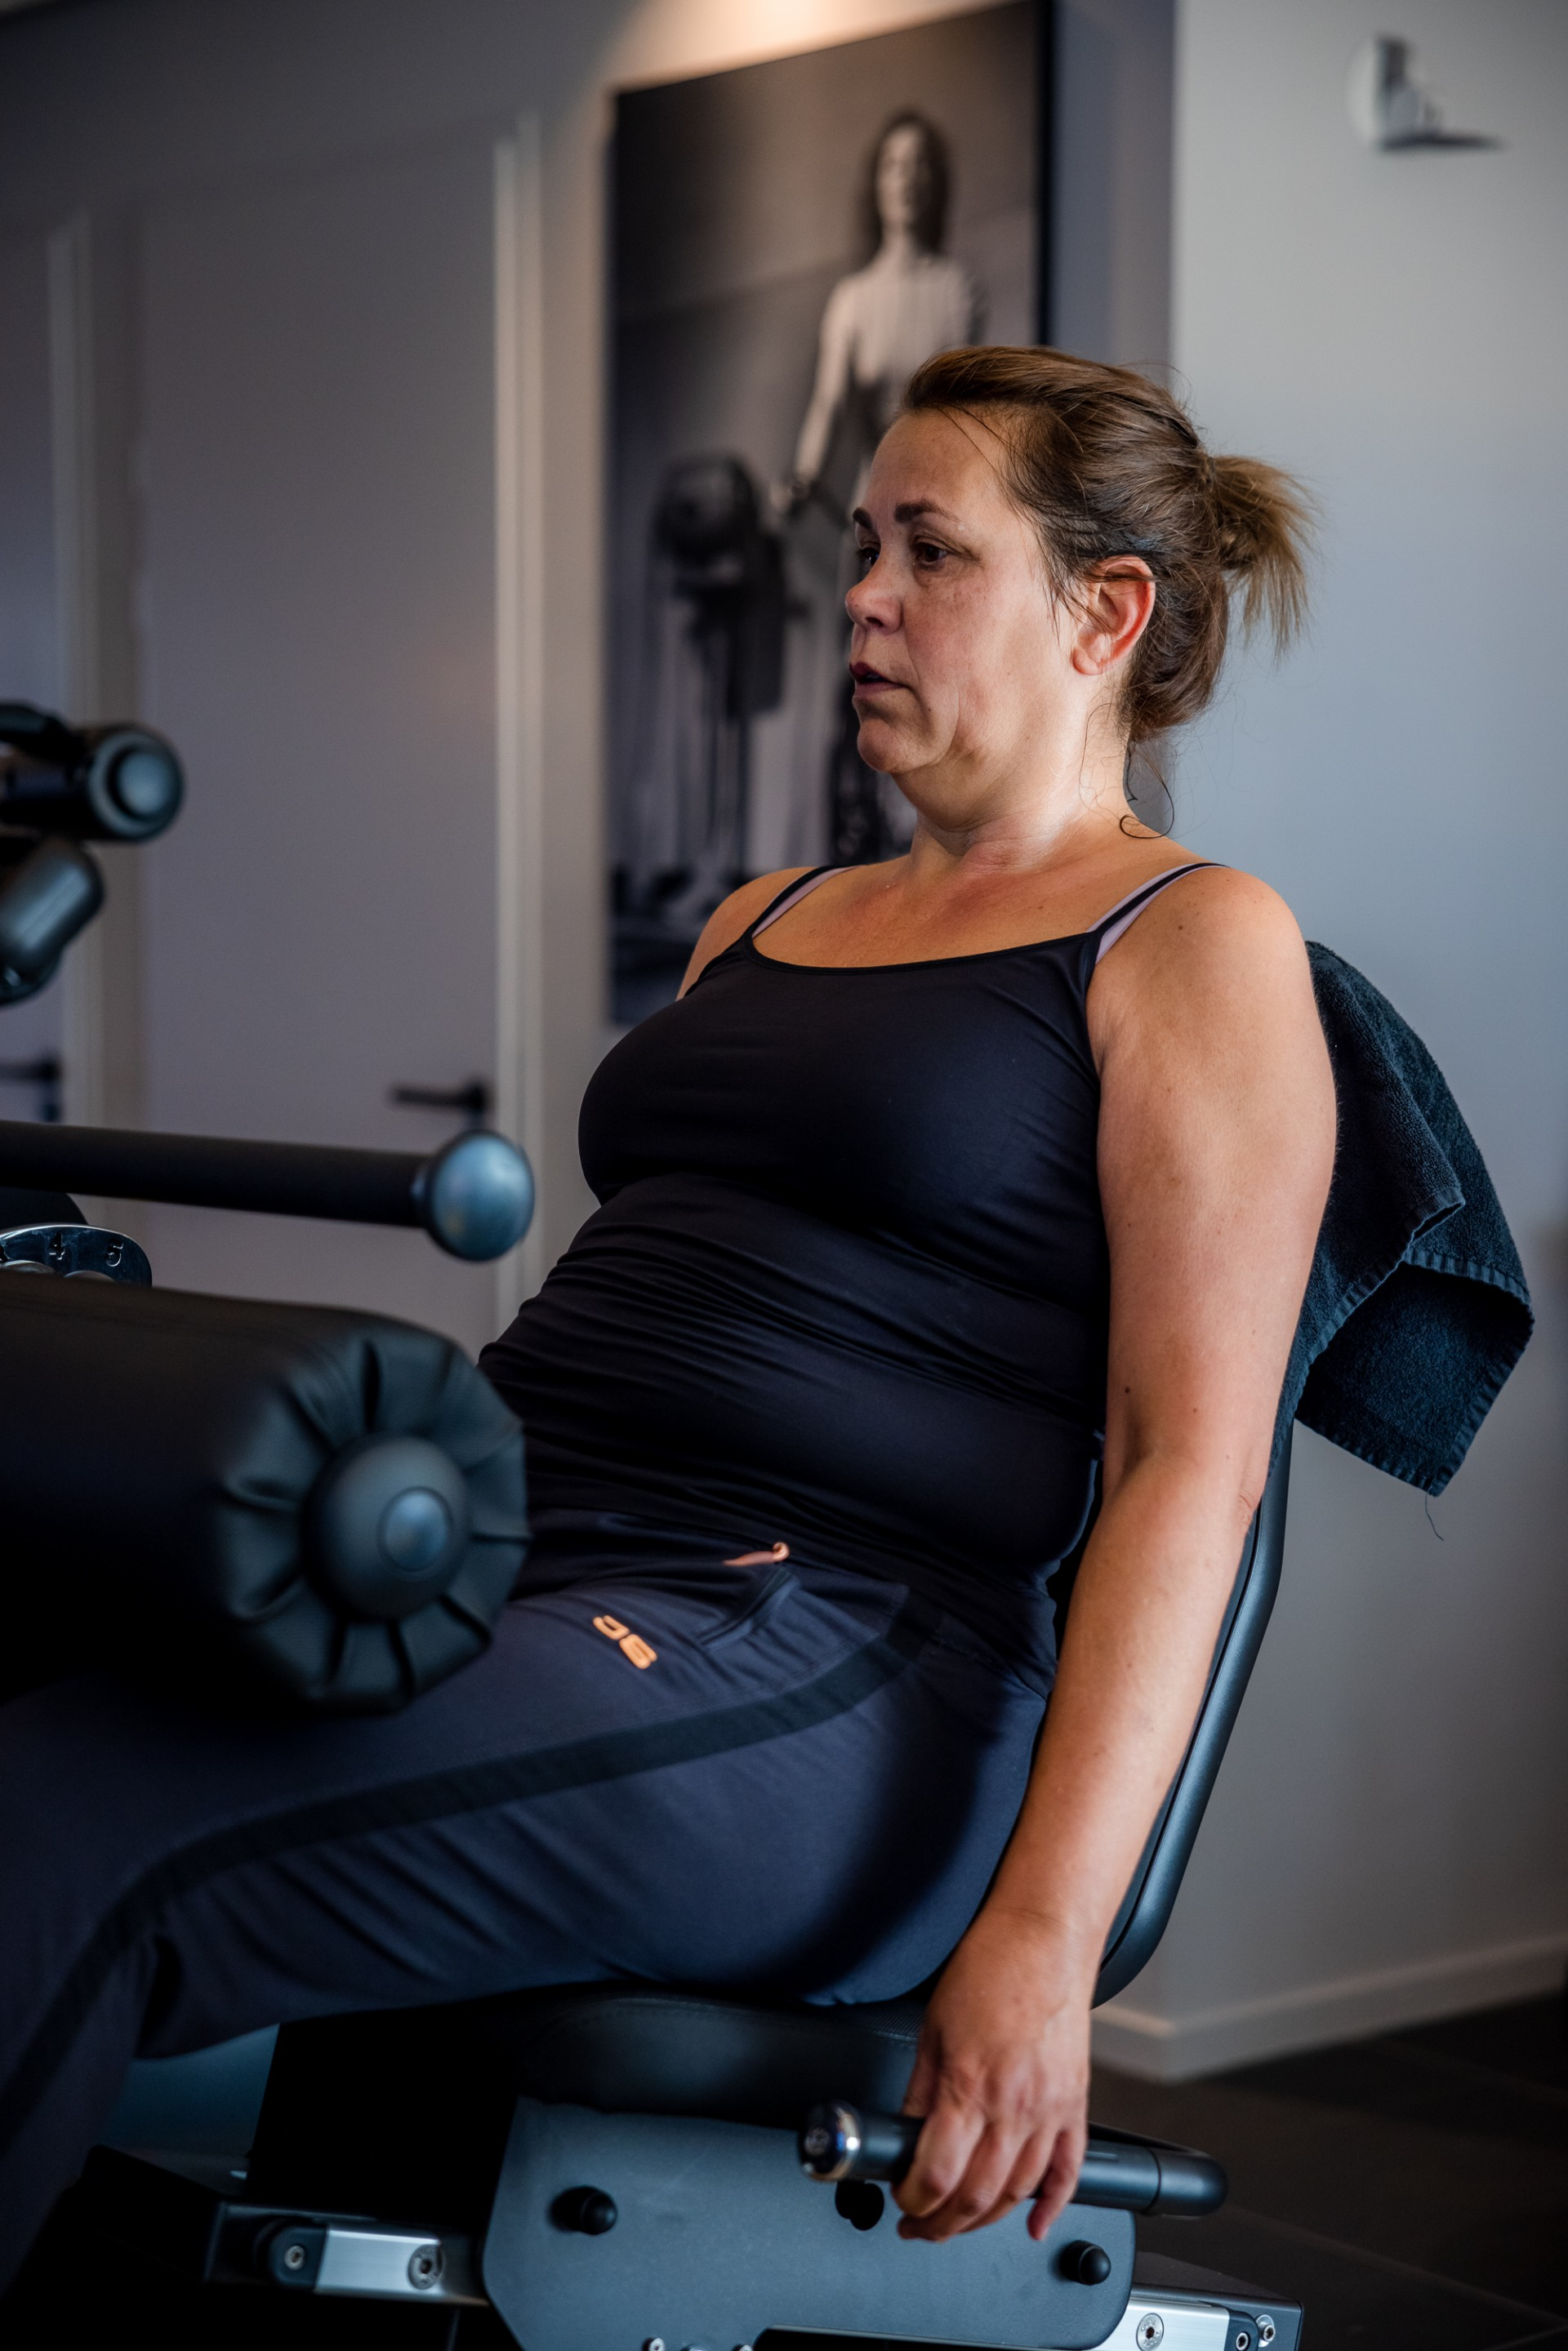 Biocircuit: Lose weight